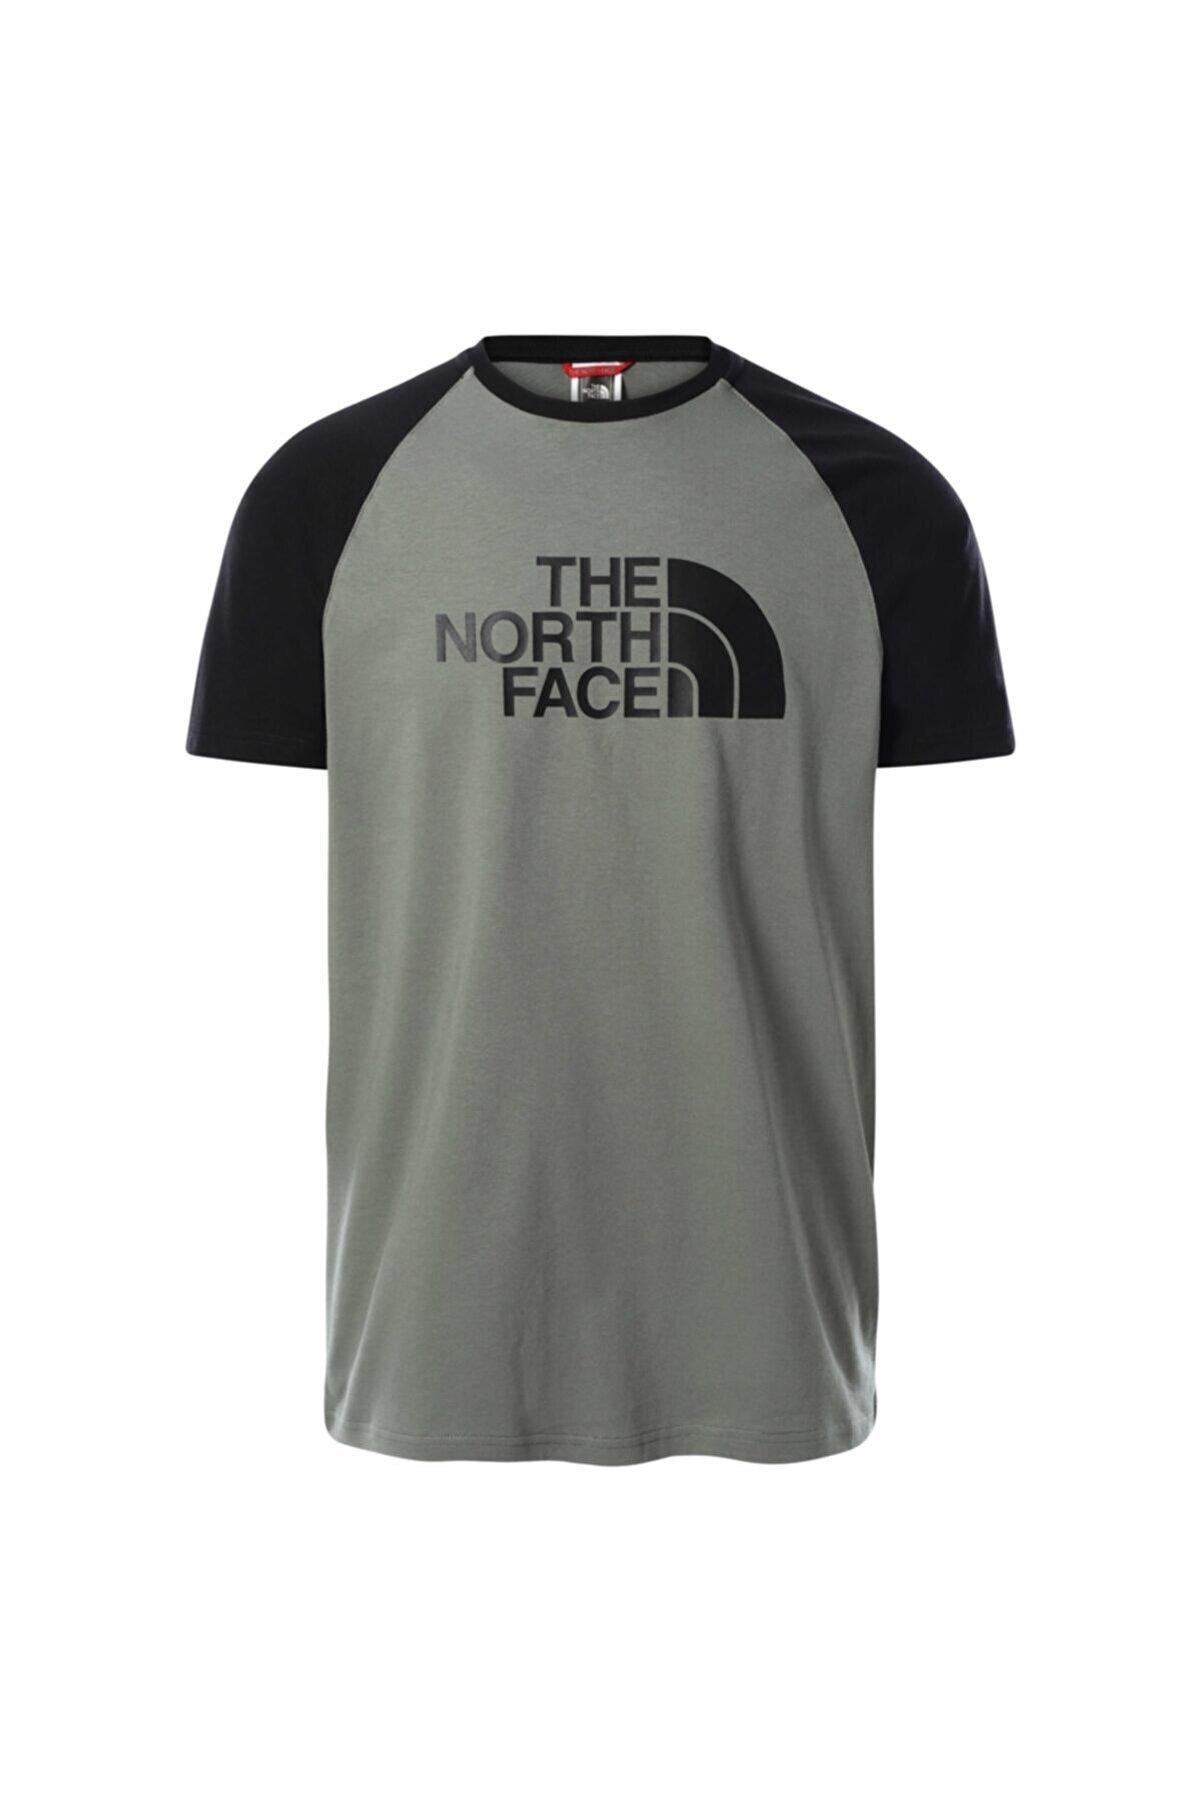 The North Face Erkek Raglan Easy Tee T-shirt - T937fvv38